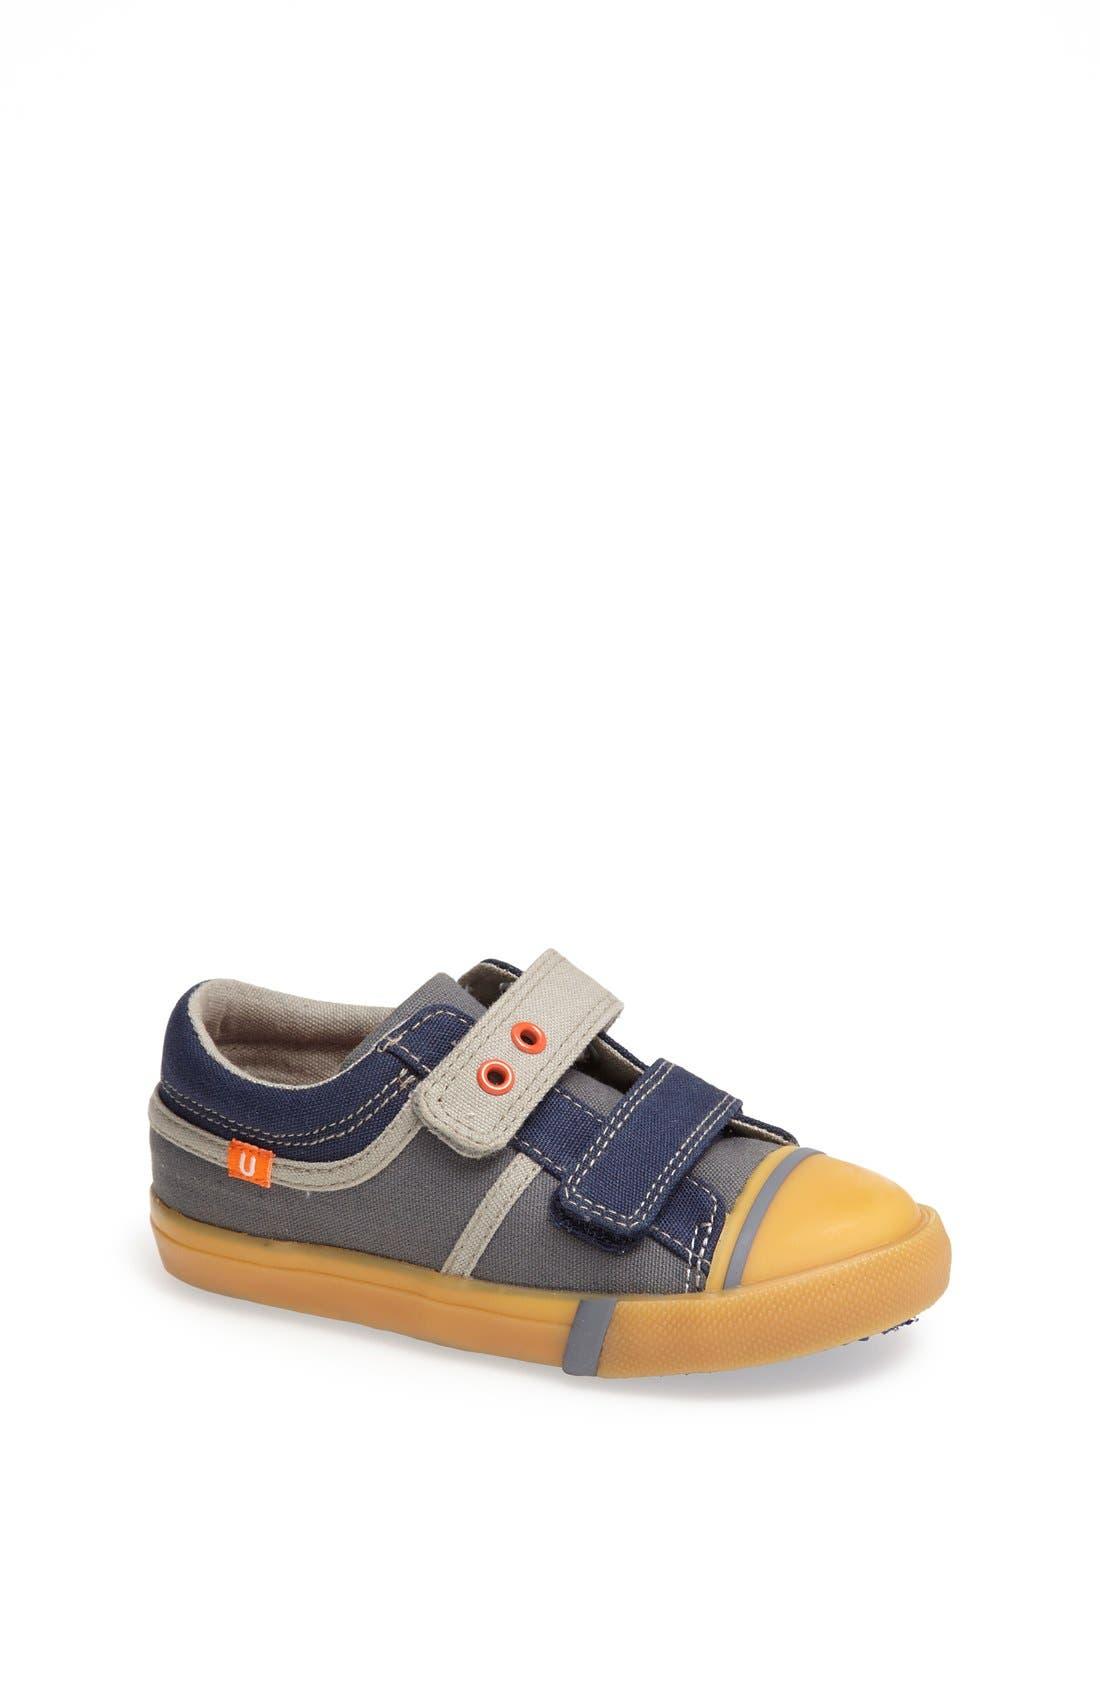 Alternate Image 1 Selected - Umi 'Mack' Sneaker (Toddler, Little Kid & Big Kid)